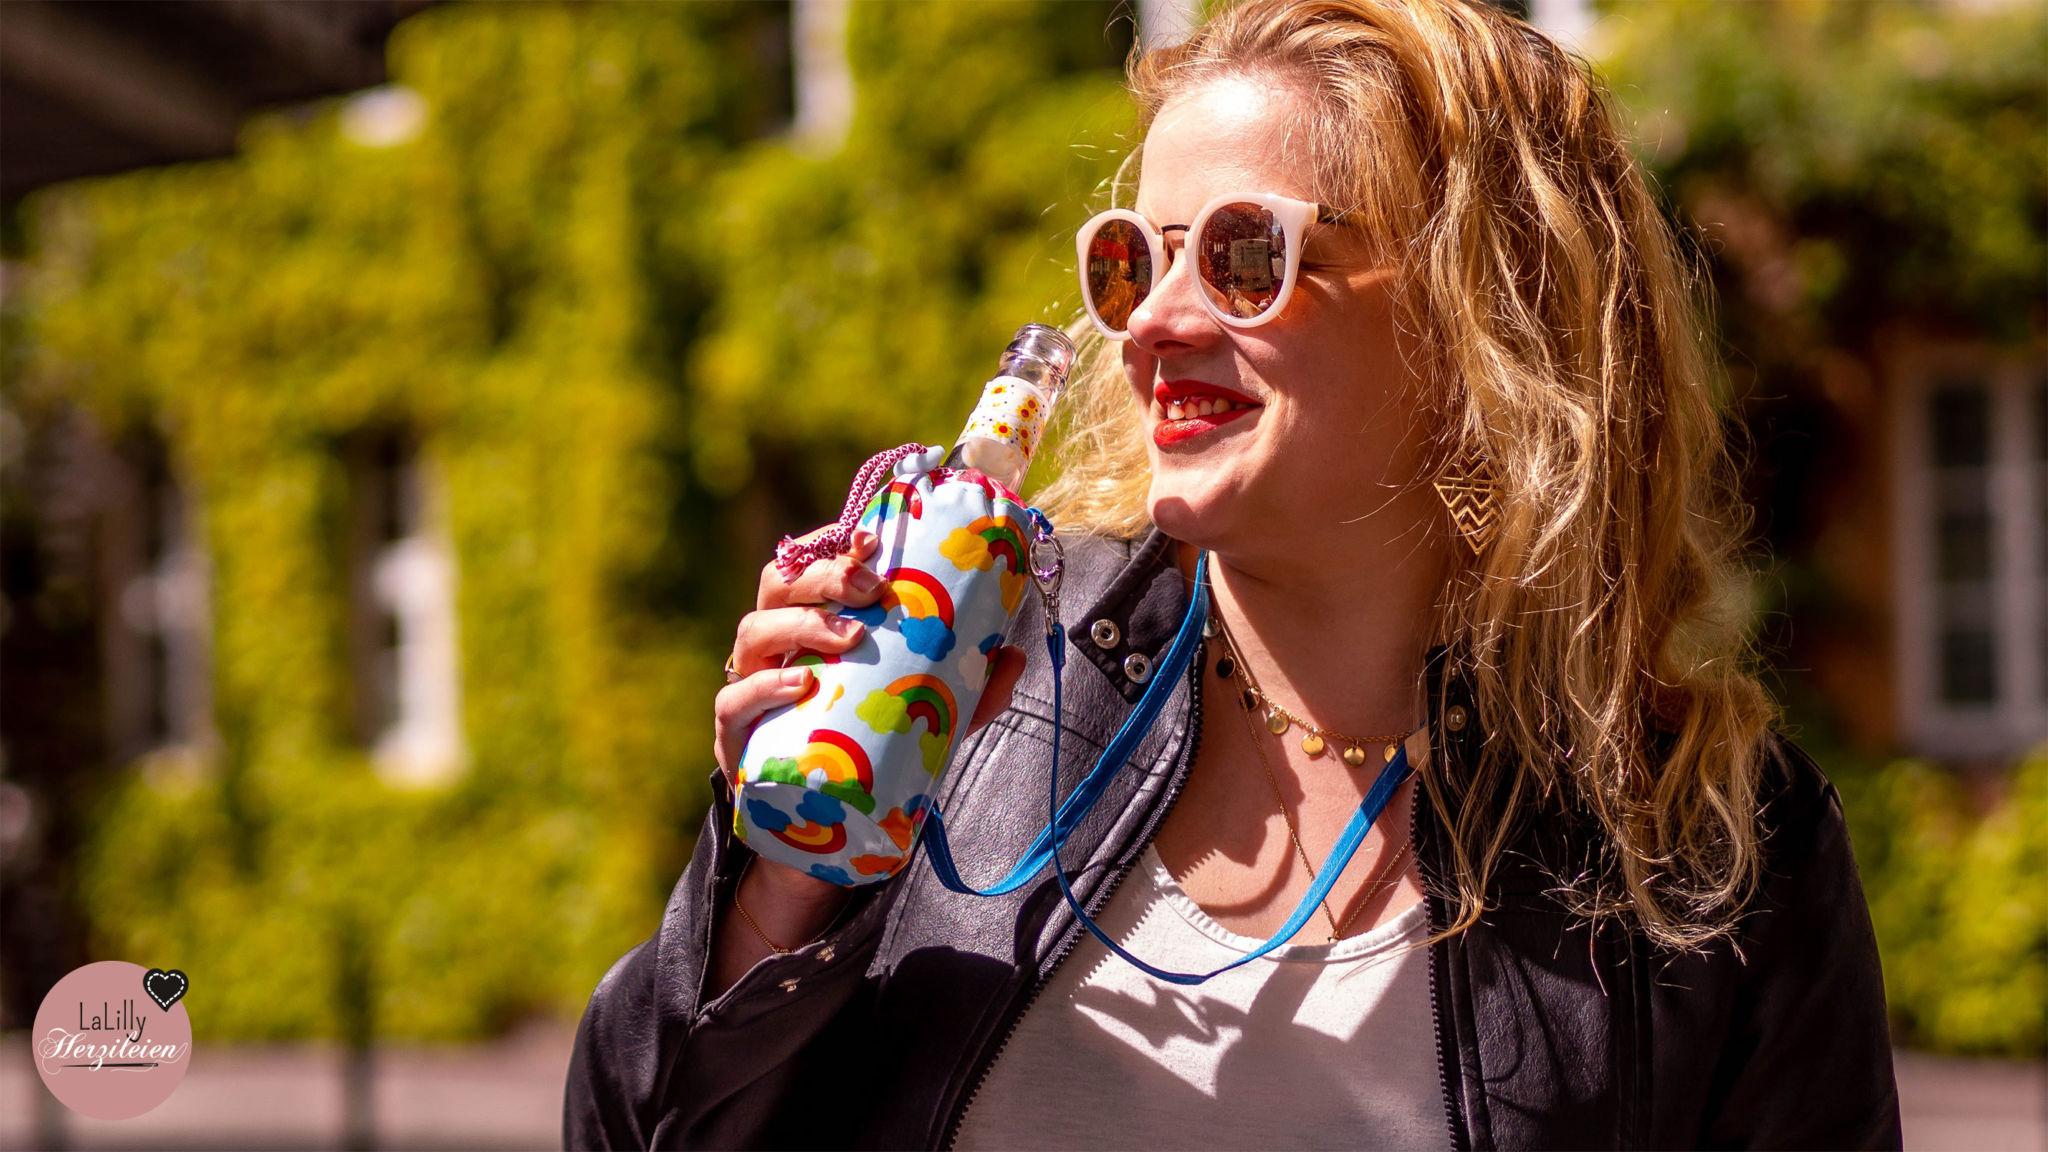 Bottlebag nähen: Refresca – Anleitung für den Paillettenperlenplunderfal